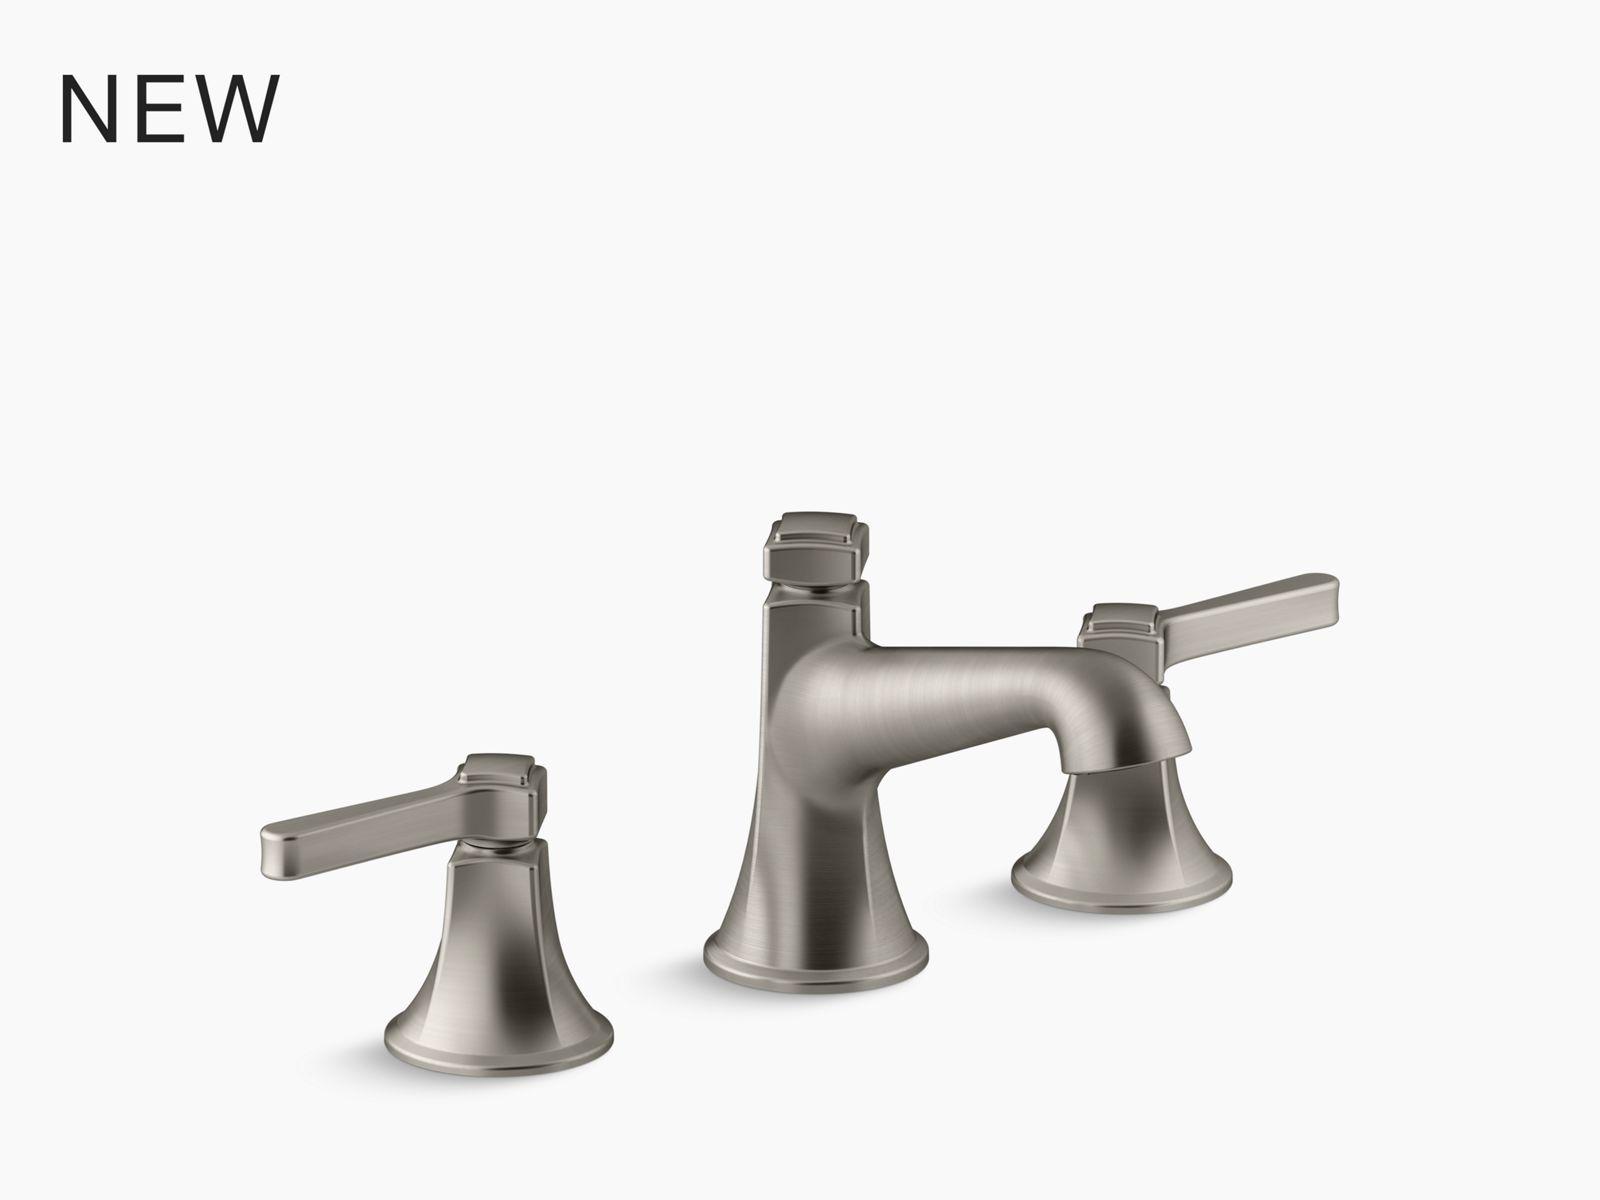 katun widespread bathroom sink faucet